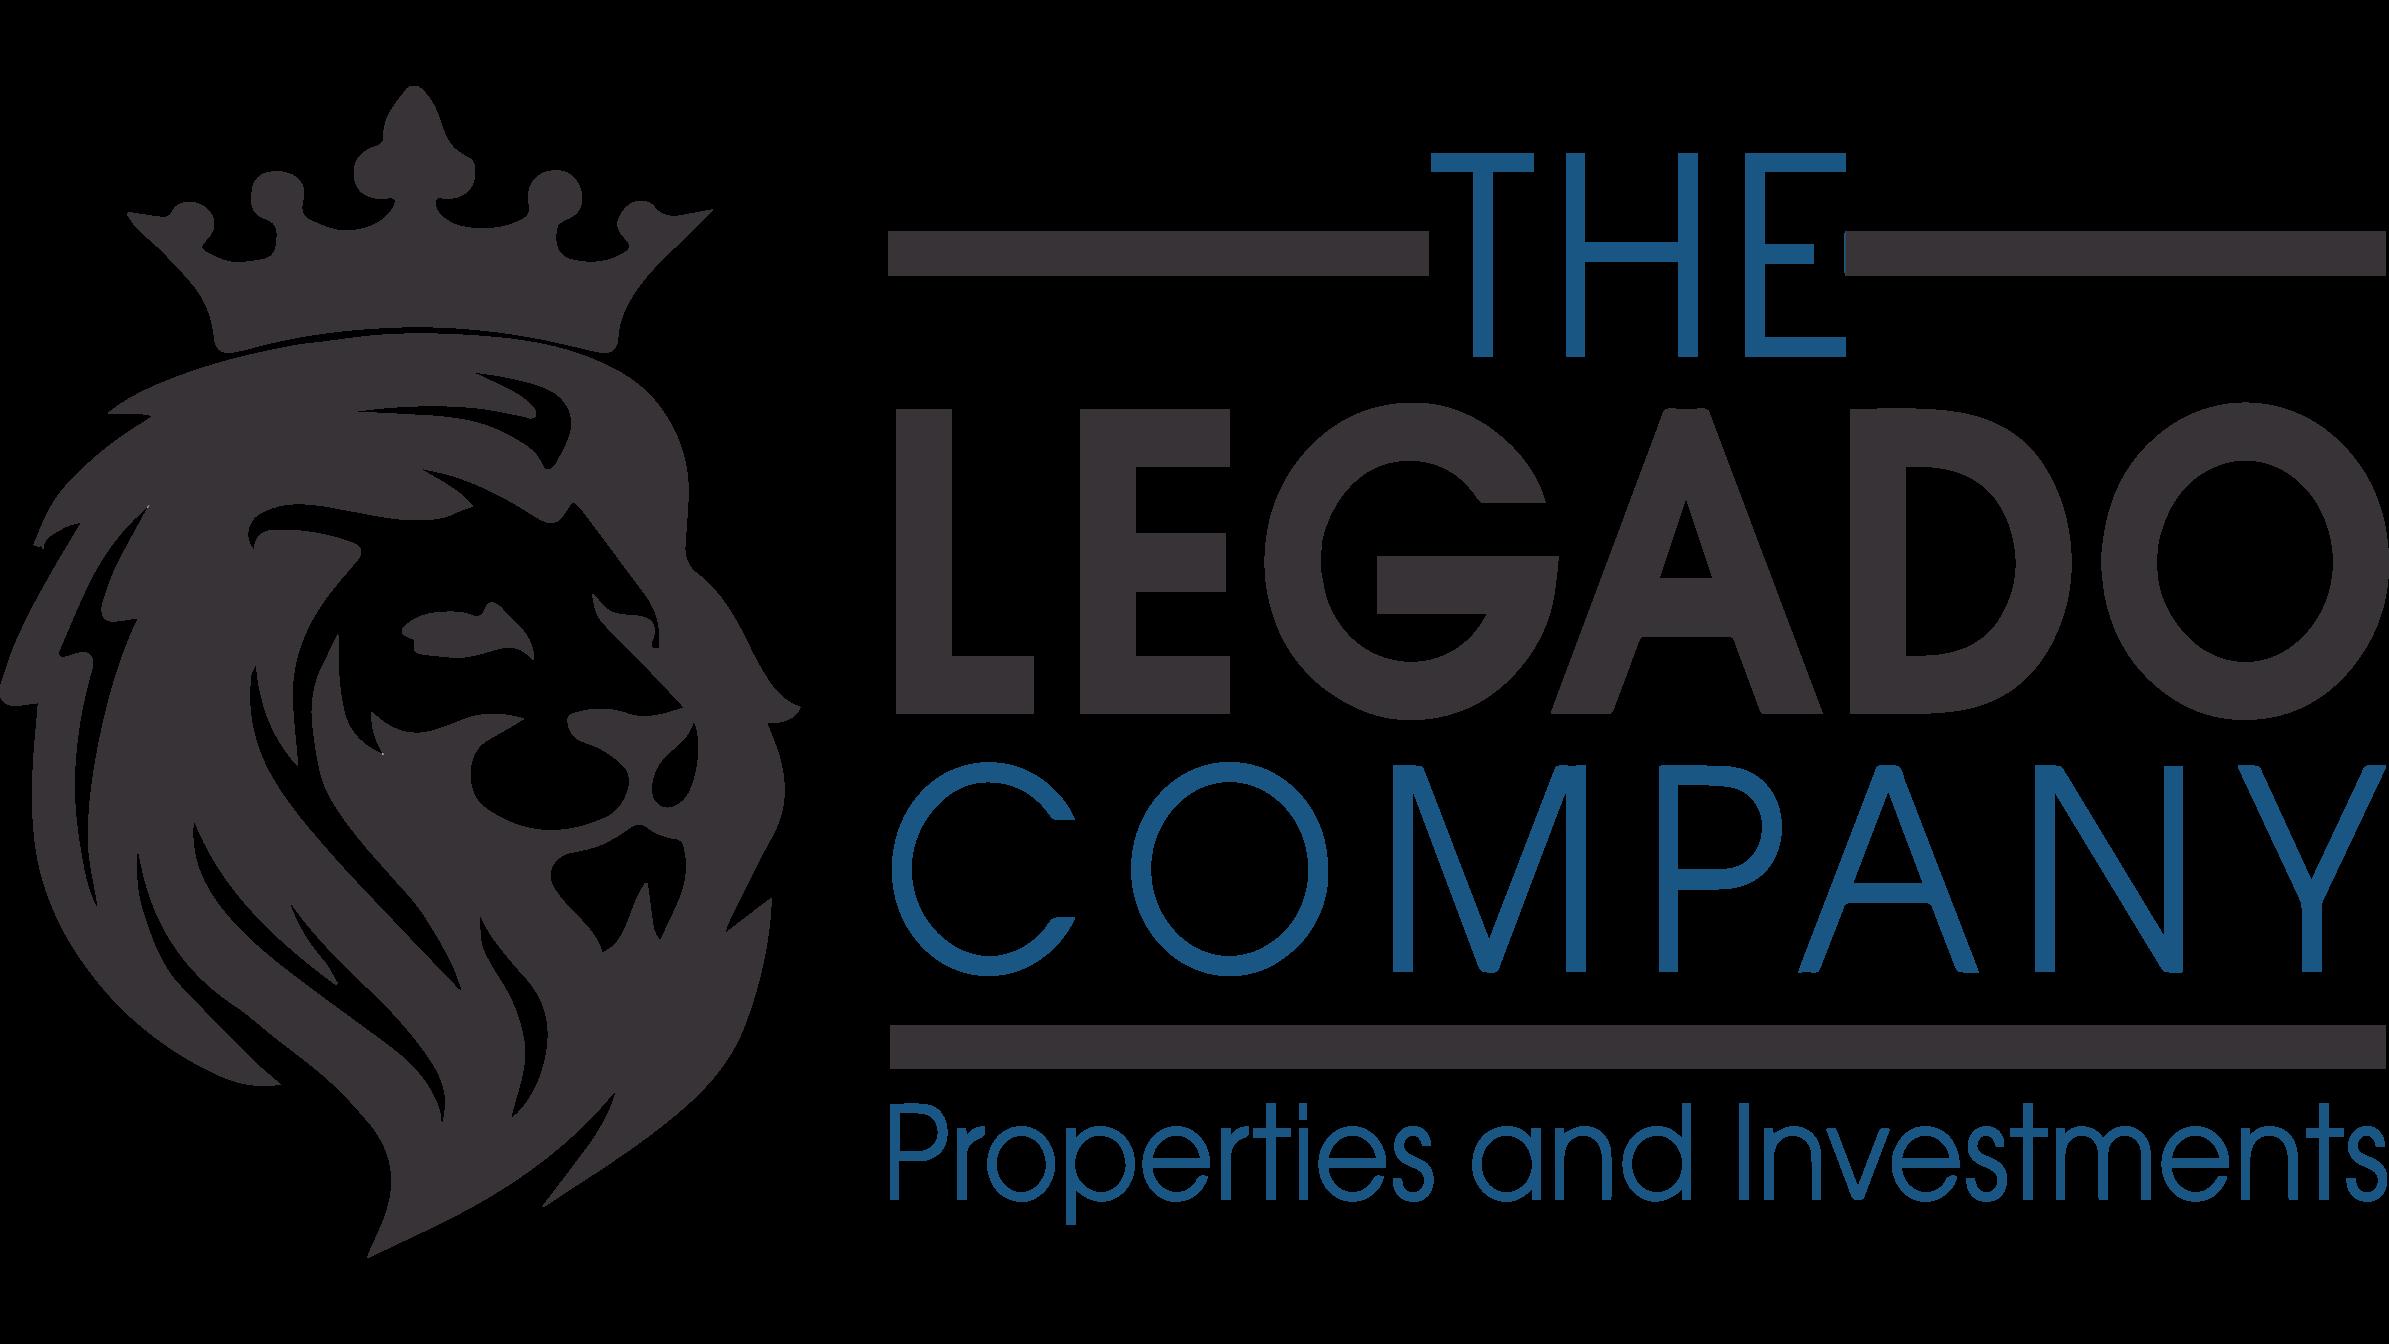 The Legado Company